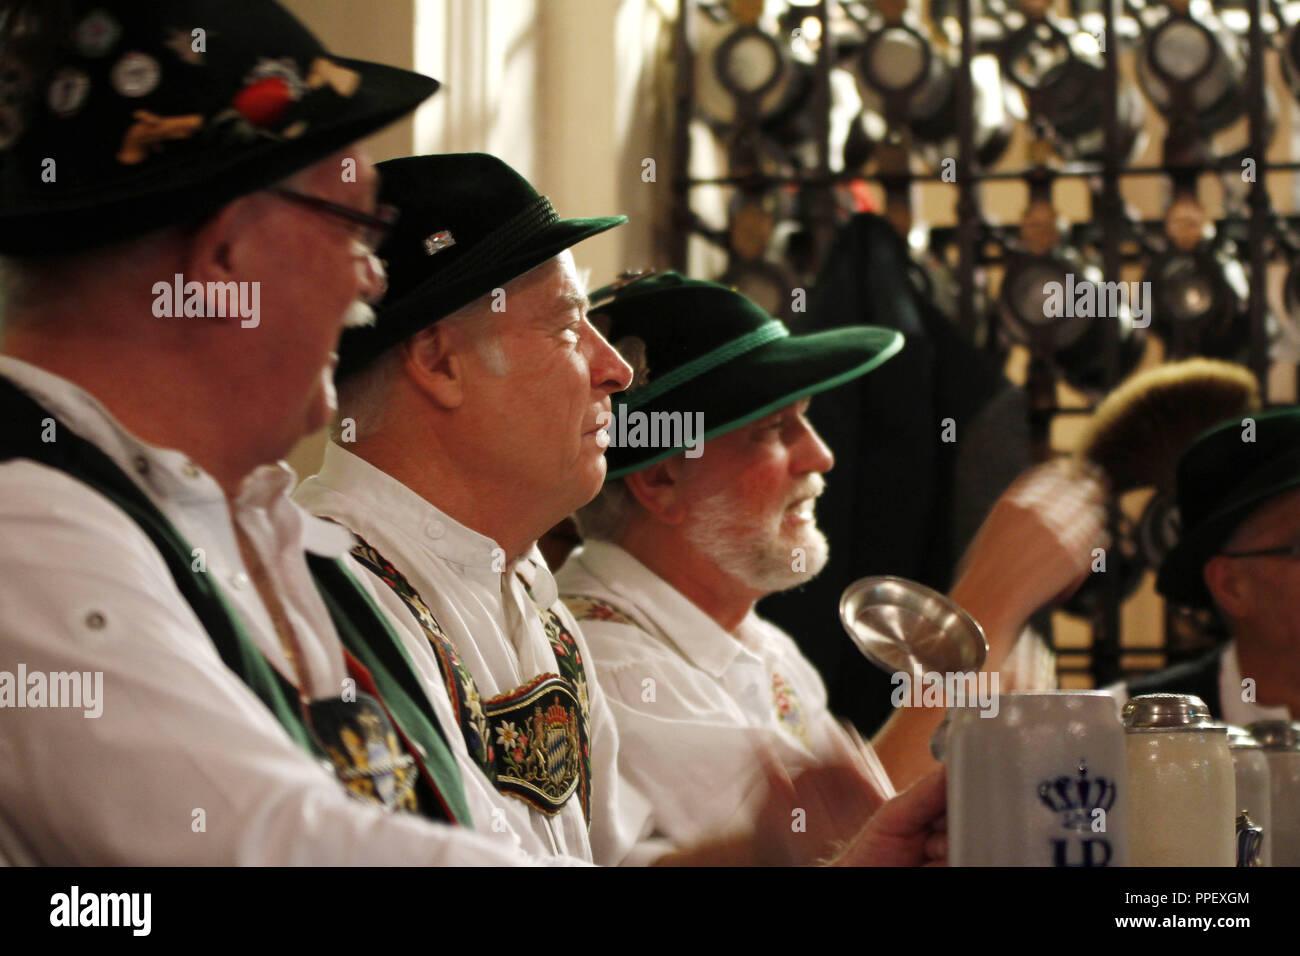 Men of the Stammtisch (regulars' table) 'Prinzregent' at the Hofbraeuhaus in good company. - Stock Image